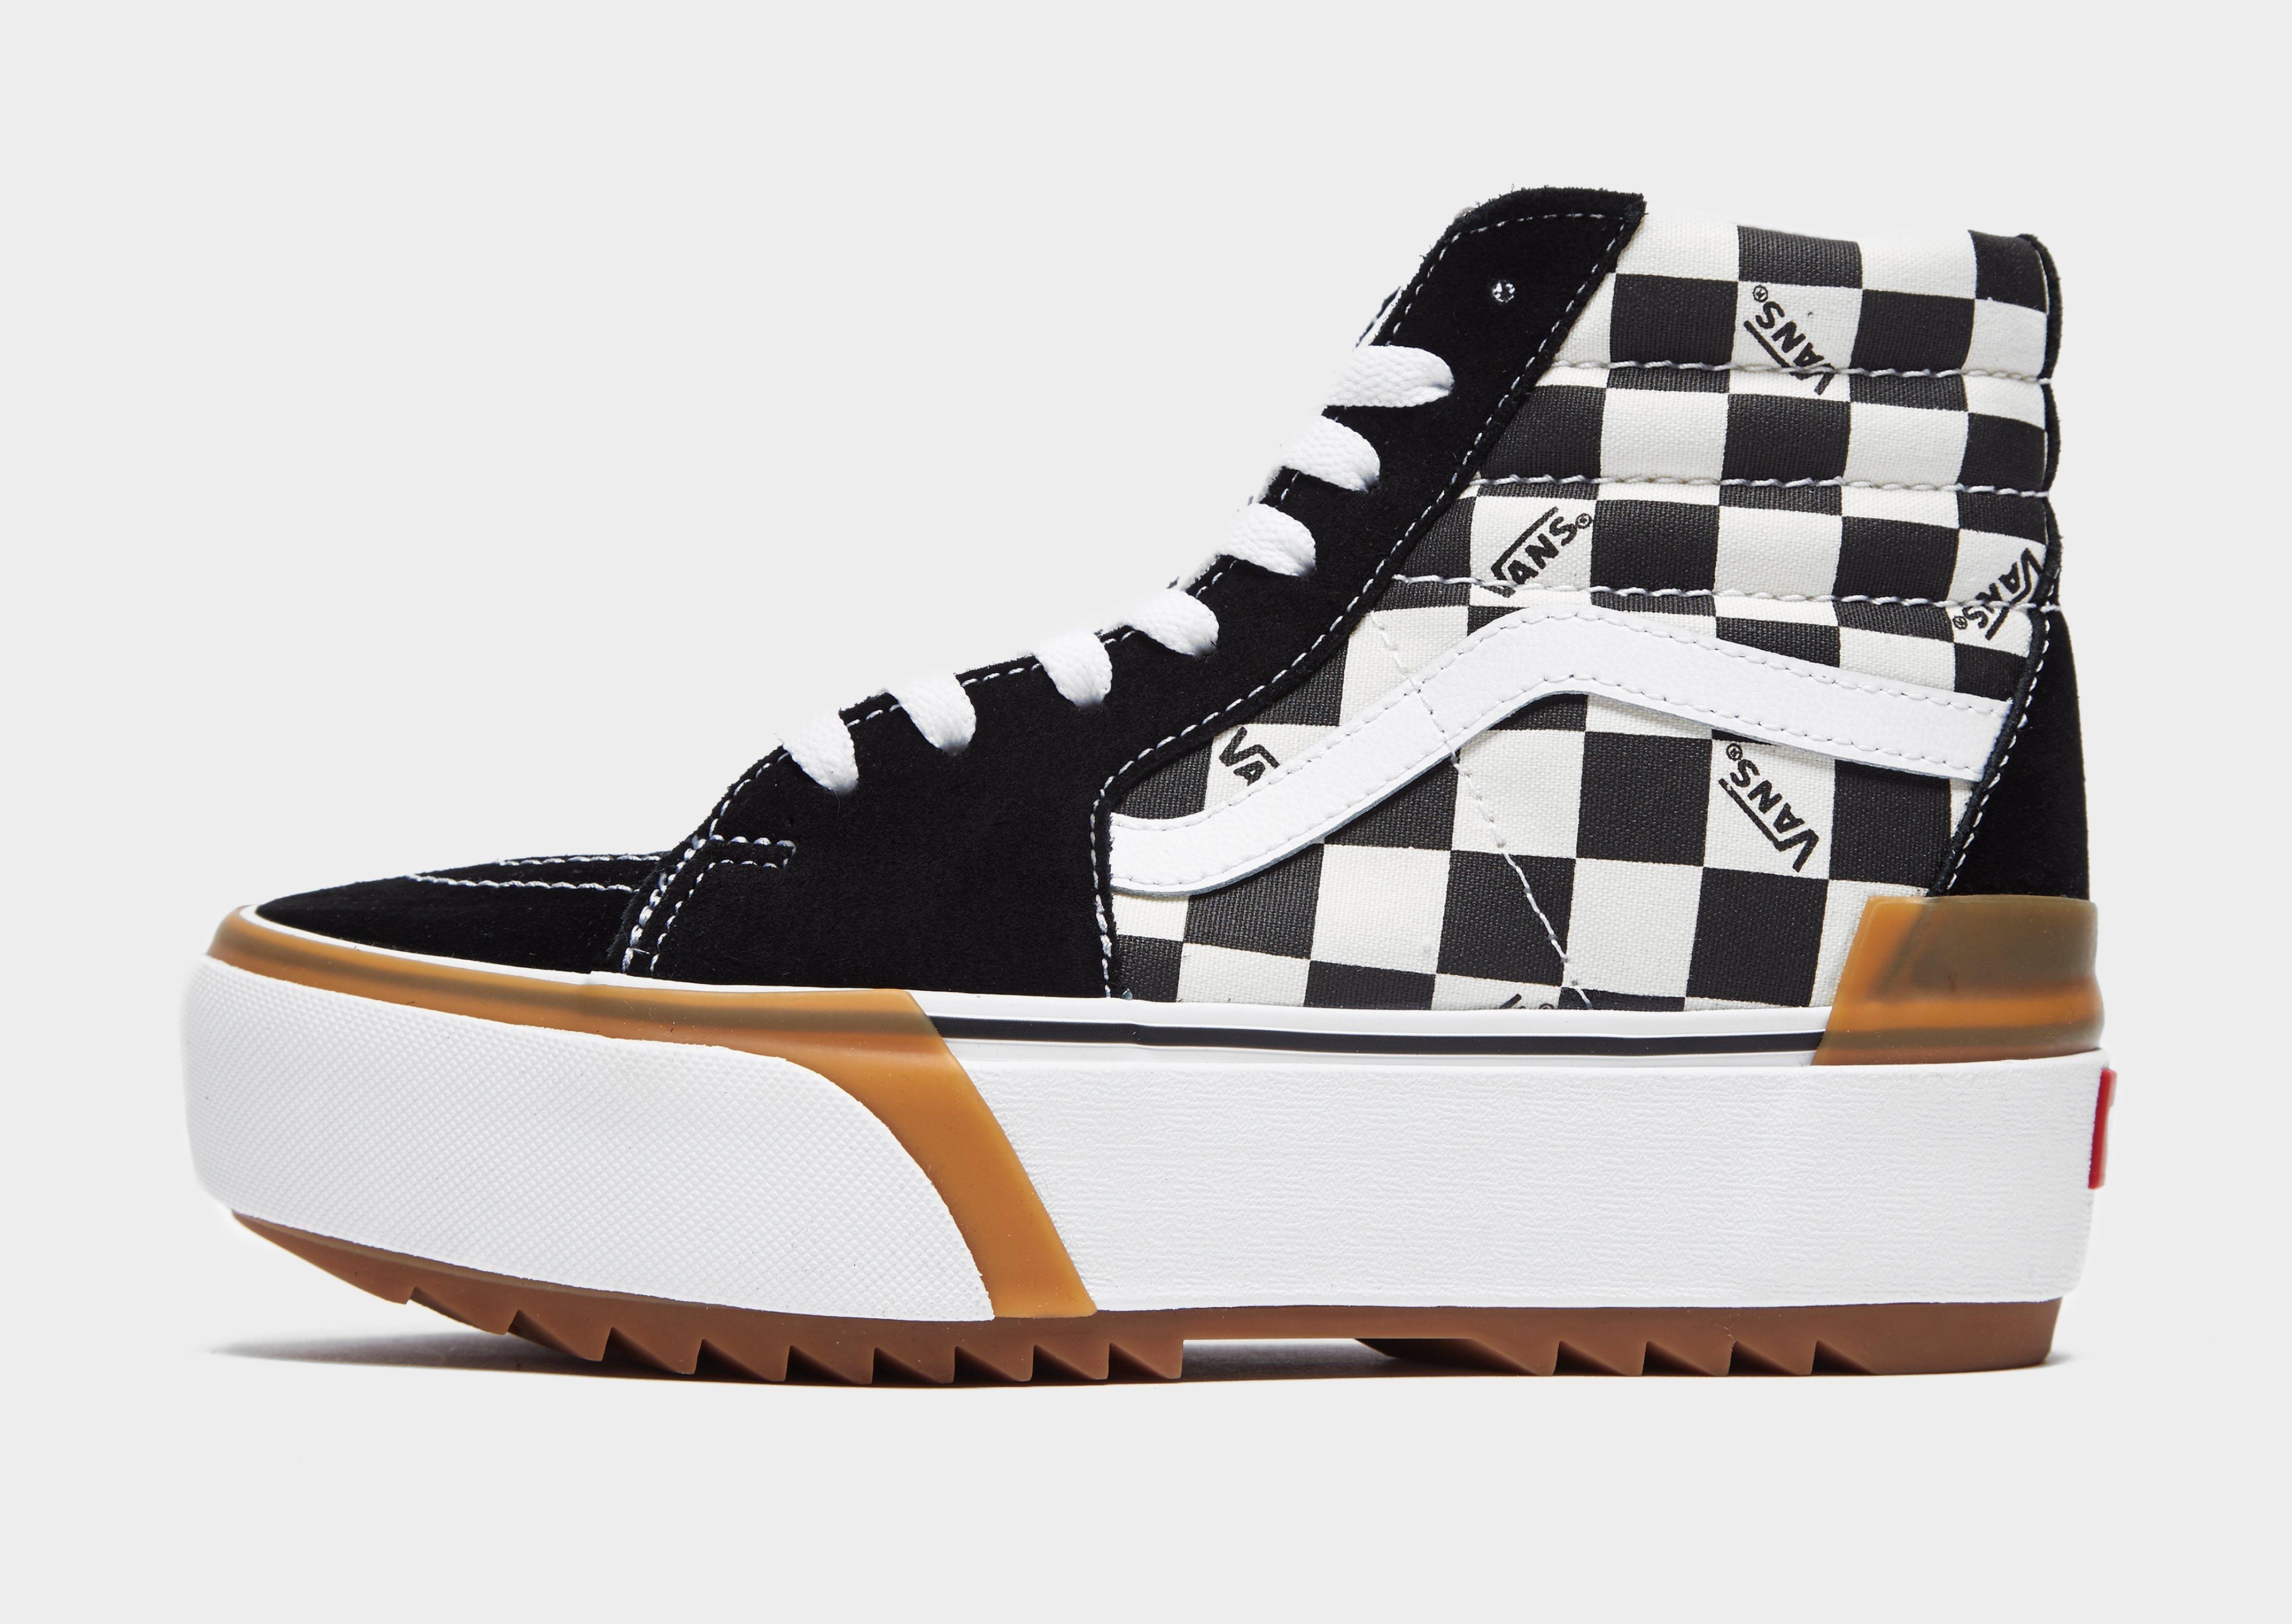 Vans Sk8 Hi Stacked Checkerboard Trainers Herre | JD Sports